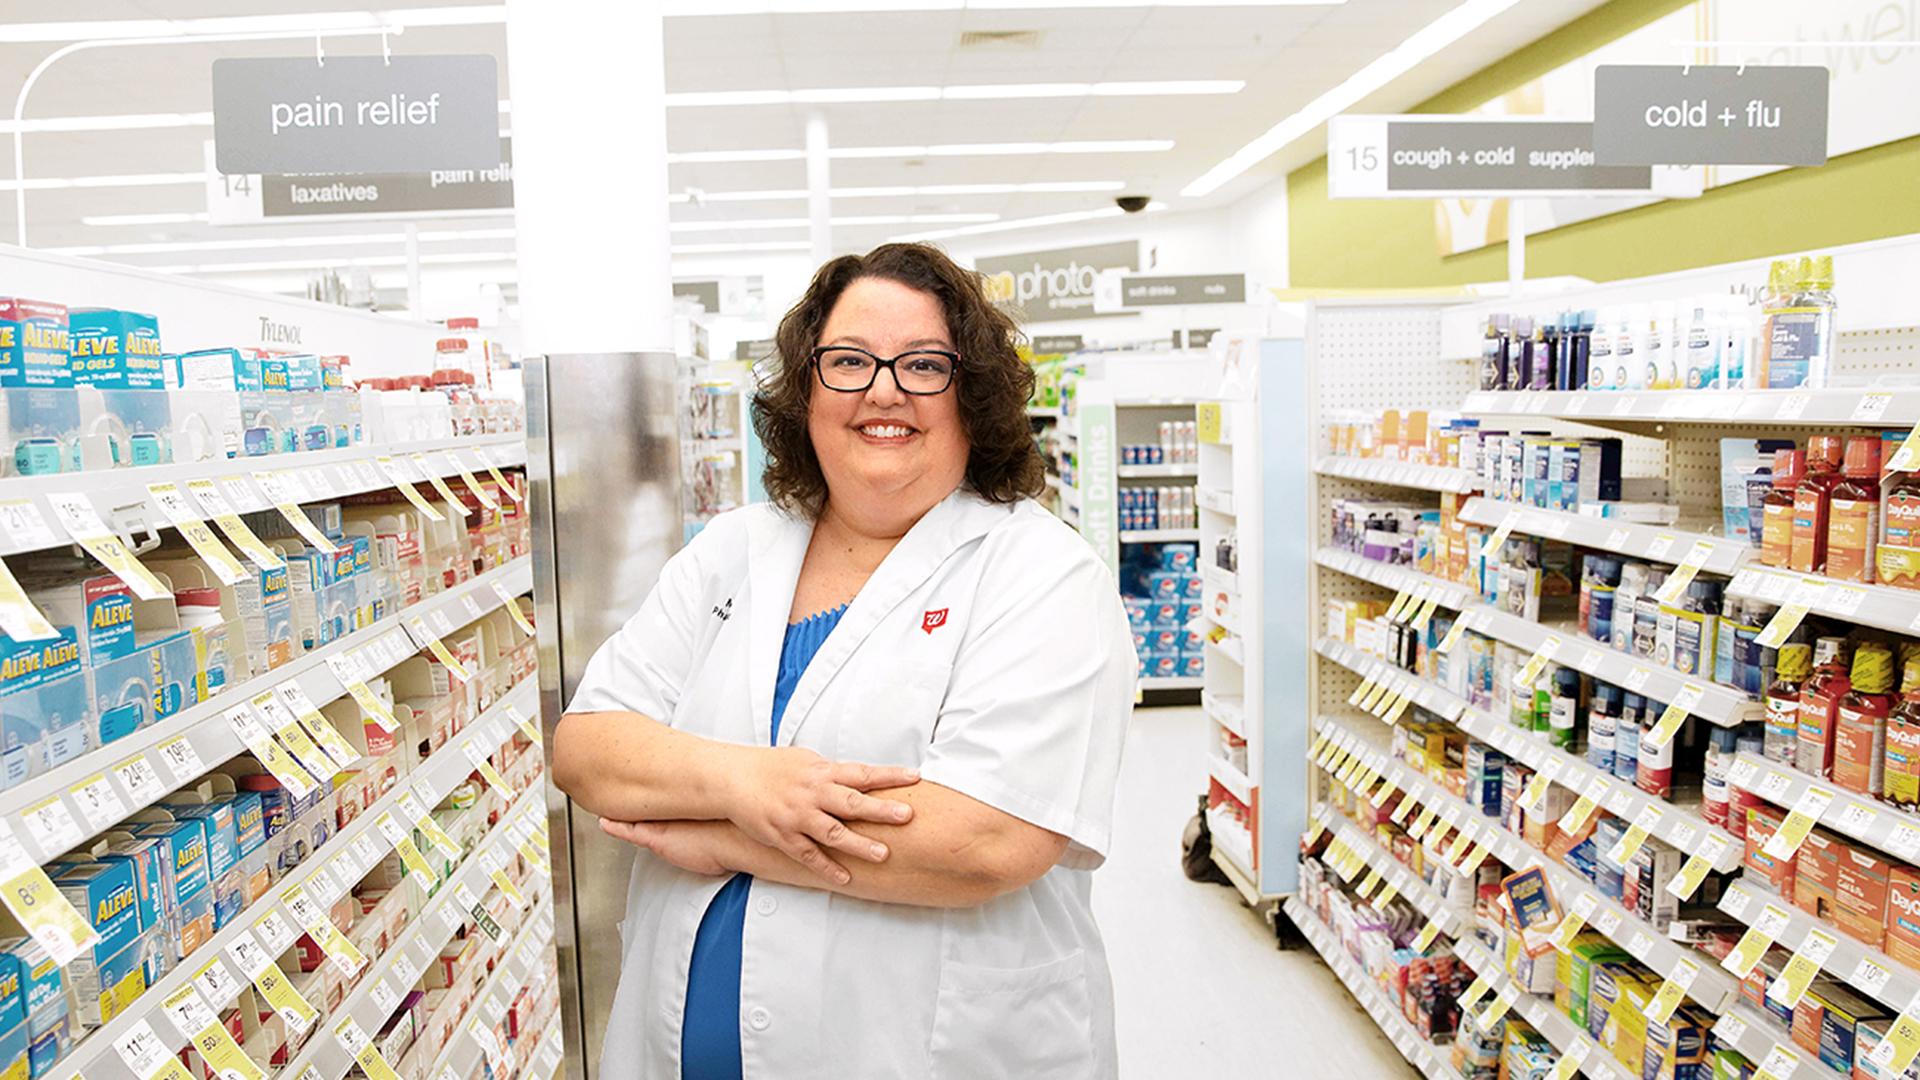 Goldsboro Walgreens Pharmacist Amongst Best In The Nation